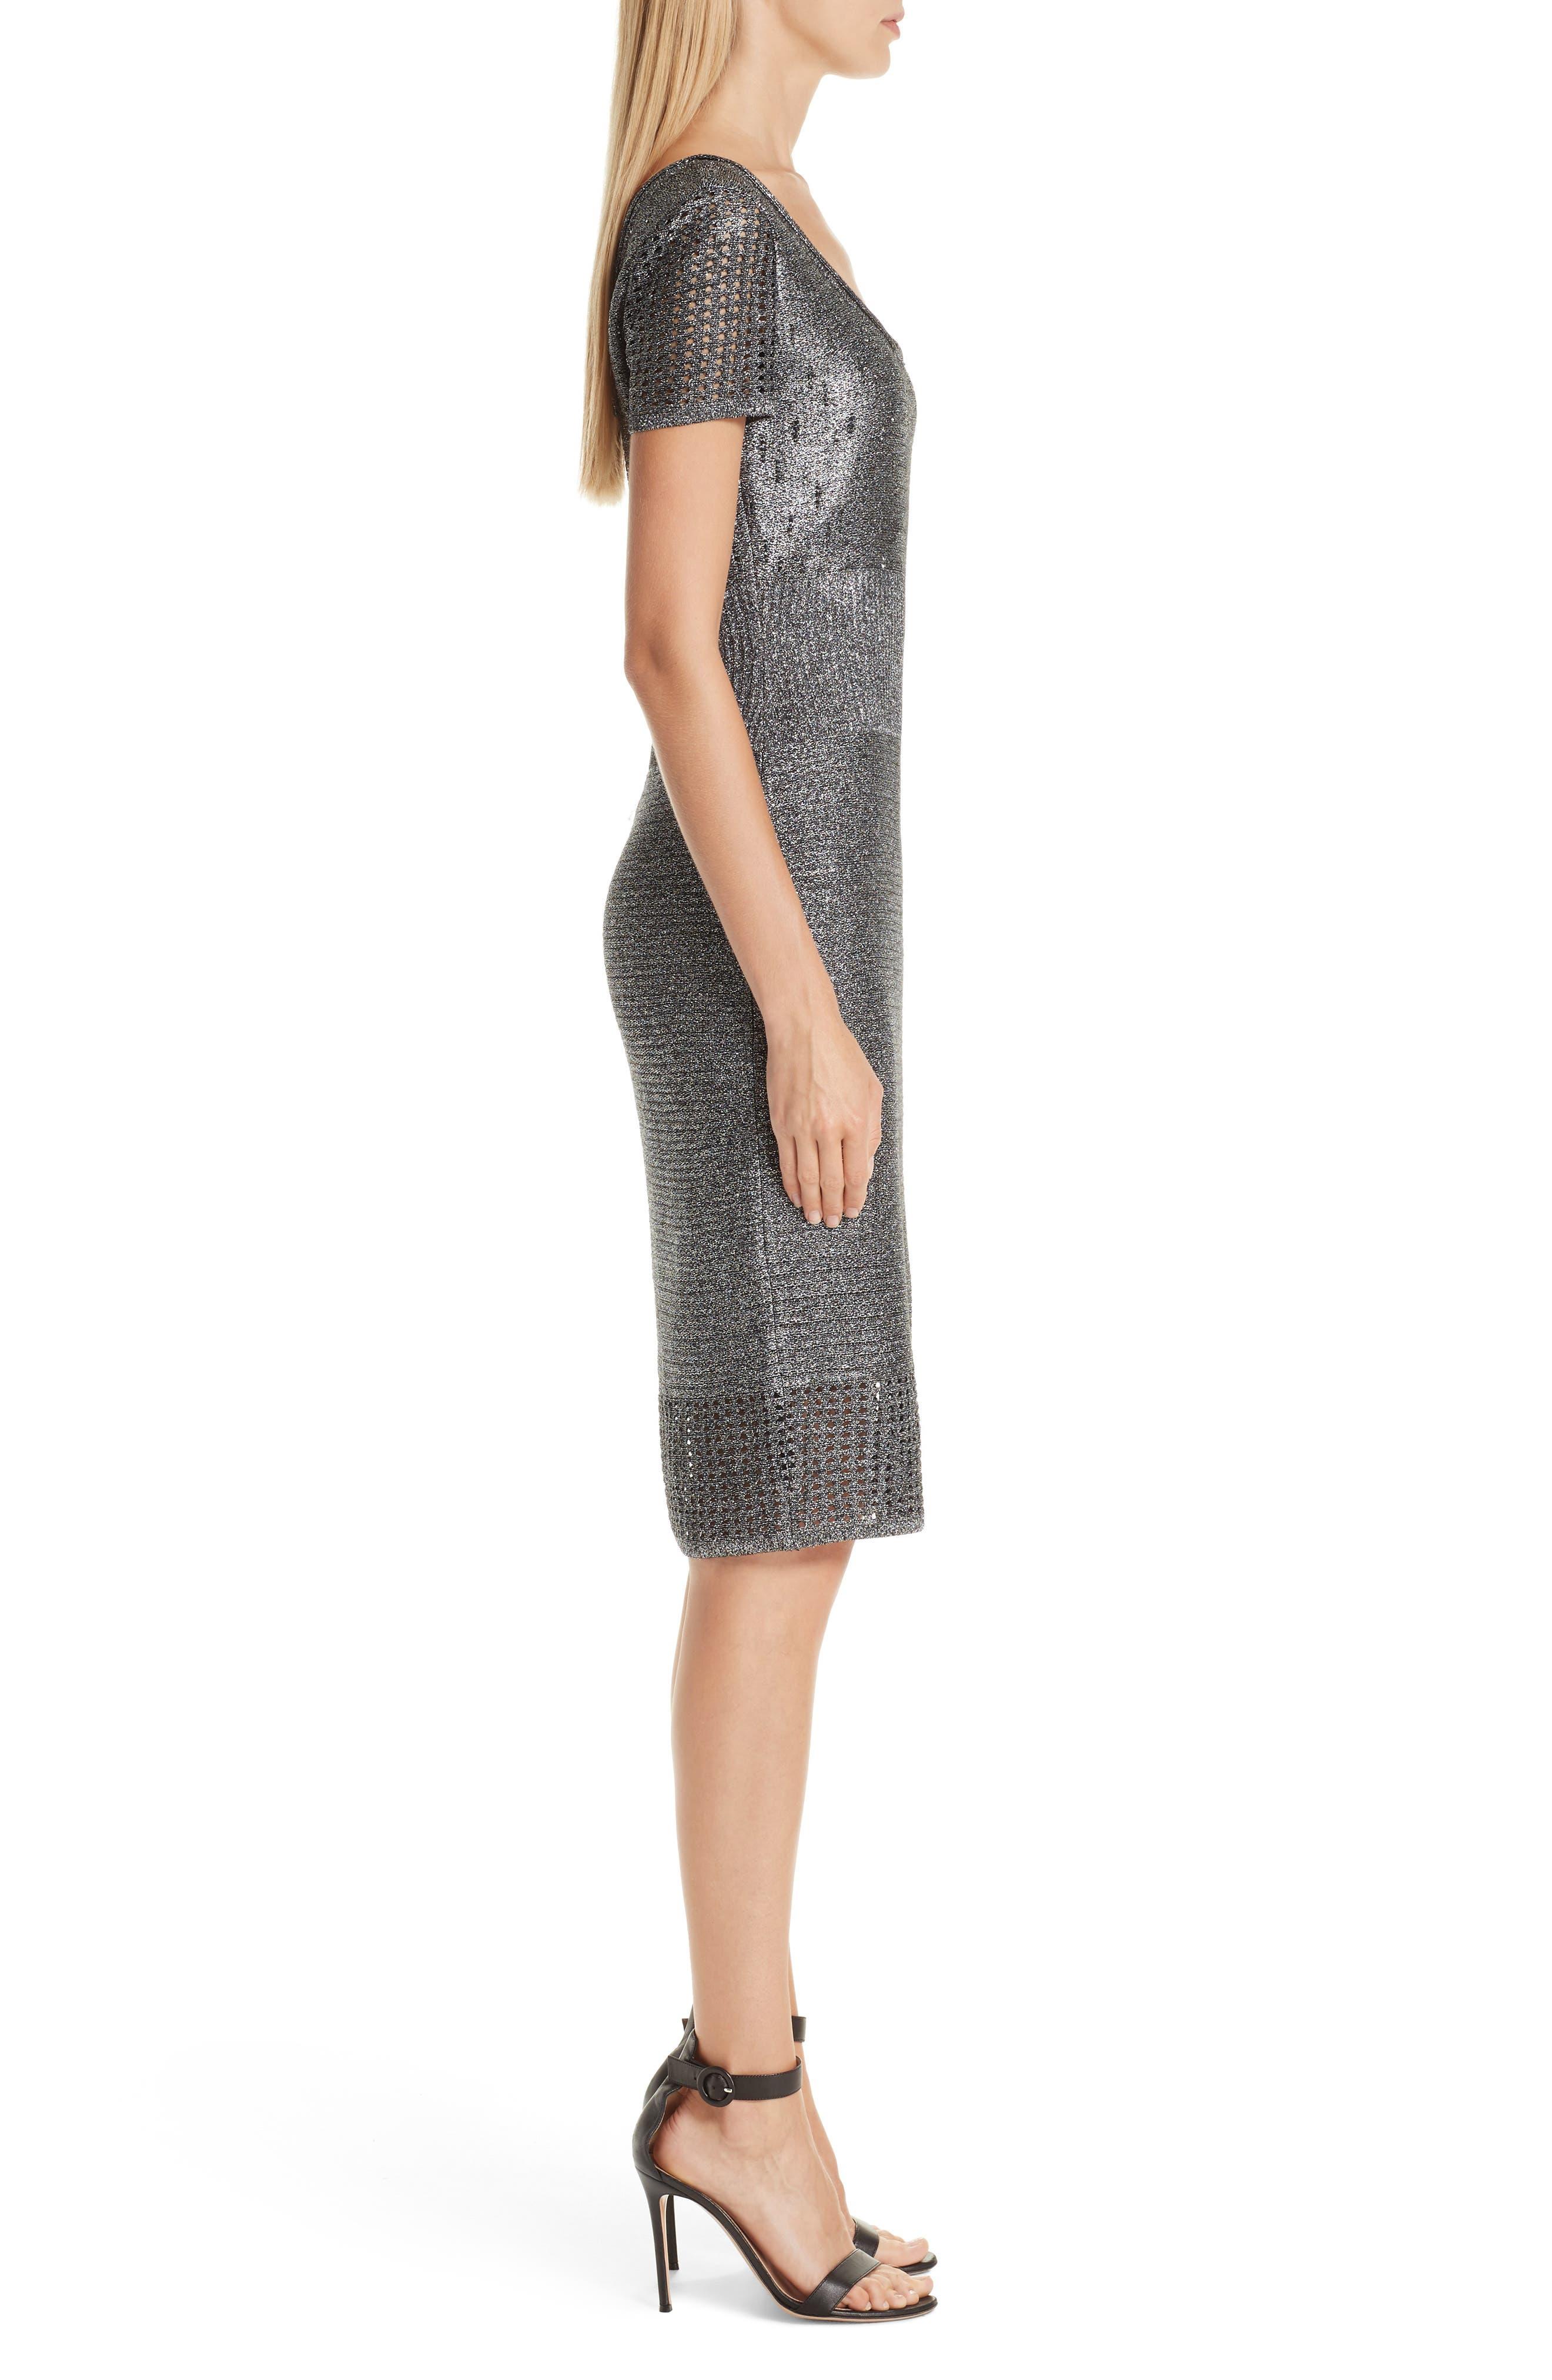 ST. JOHN COLLECTION, Metallic Plaited Mixed Knit Dress, Alternate thumbnail 4, color, GUNMETAL/ CAVIAR